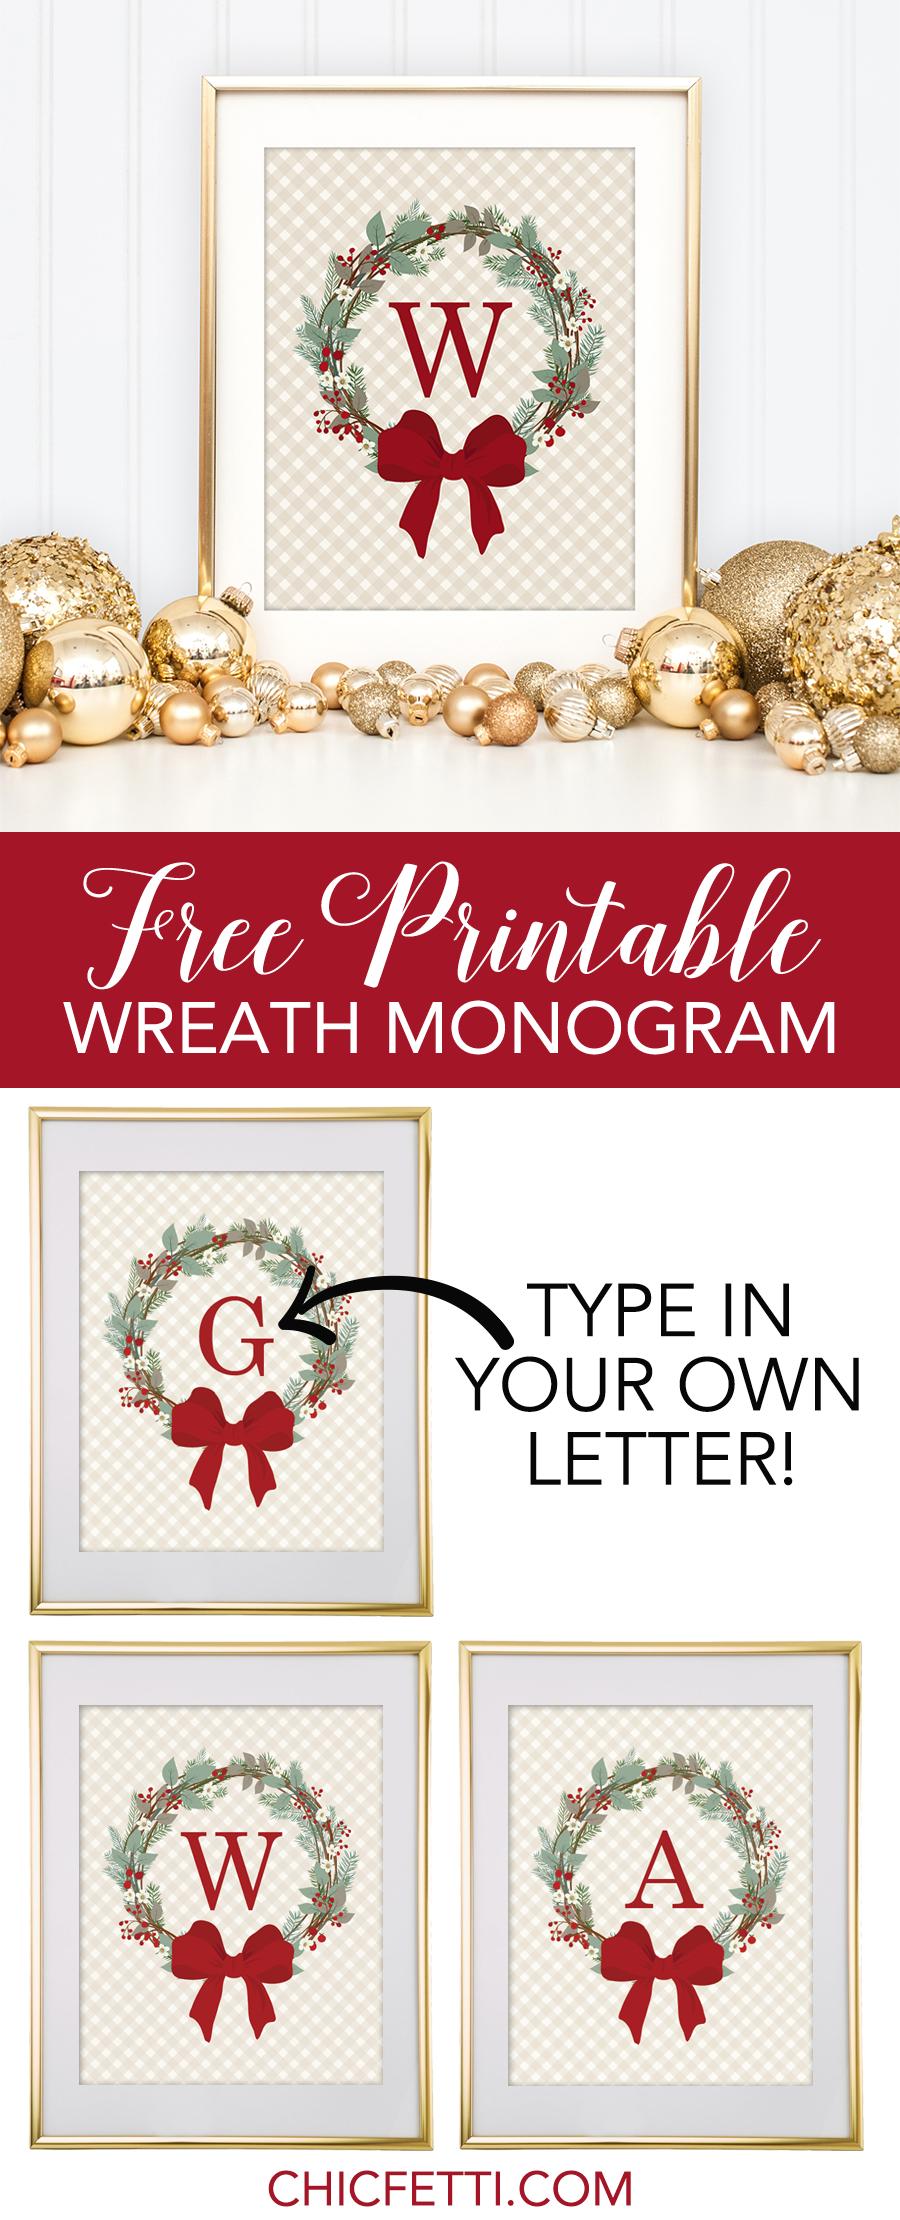 Free-Printable-Monogram-Maker-Christmas-Weath - Diybunker - Create Your Own Free Printable Christmas Cards